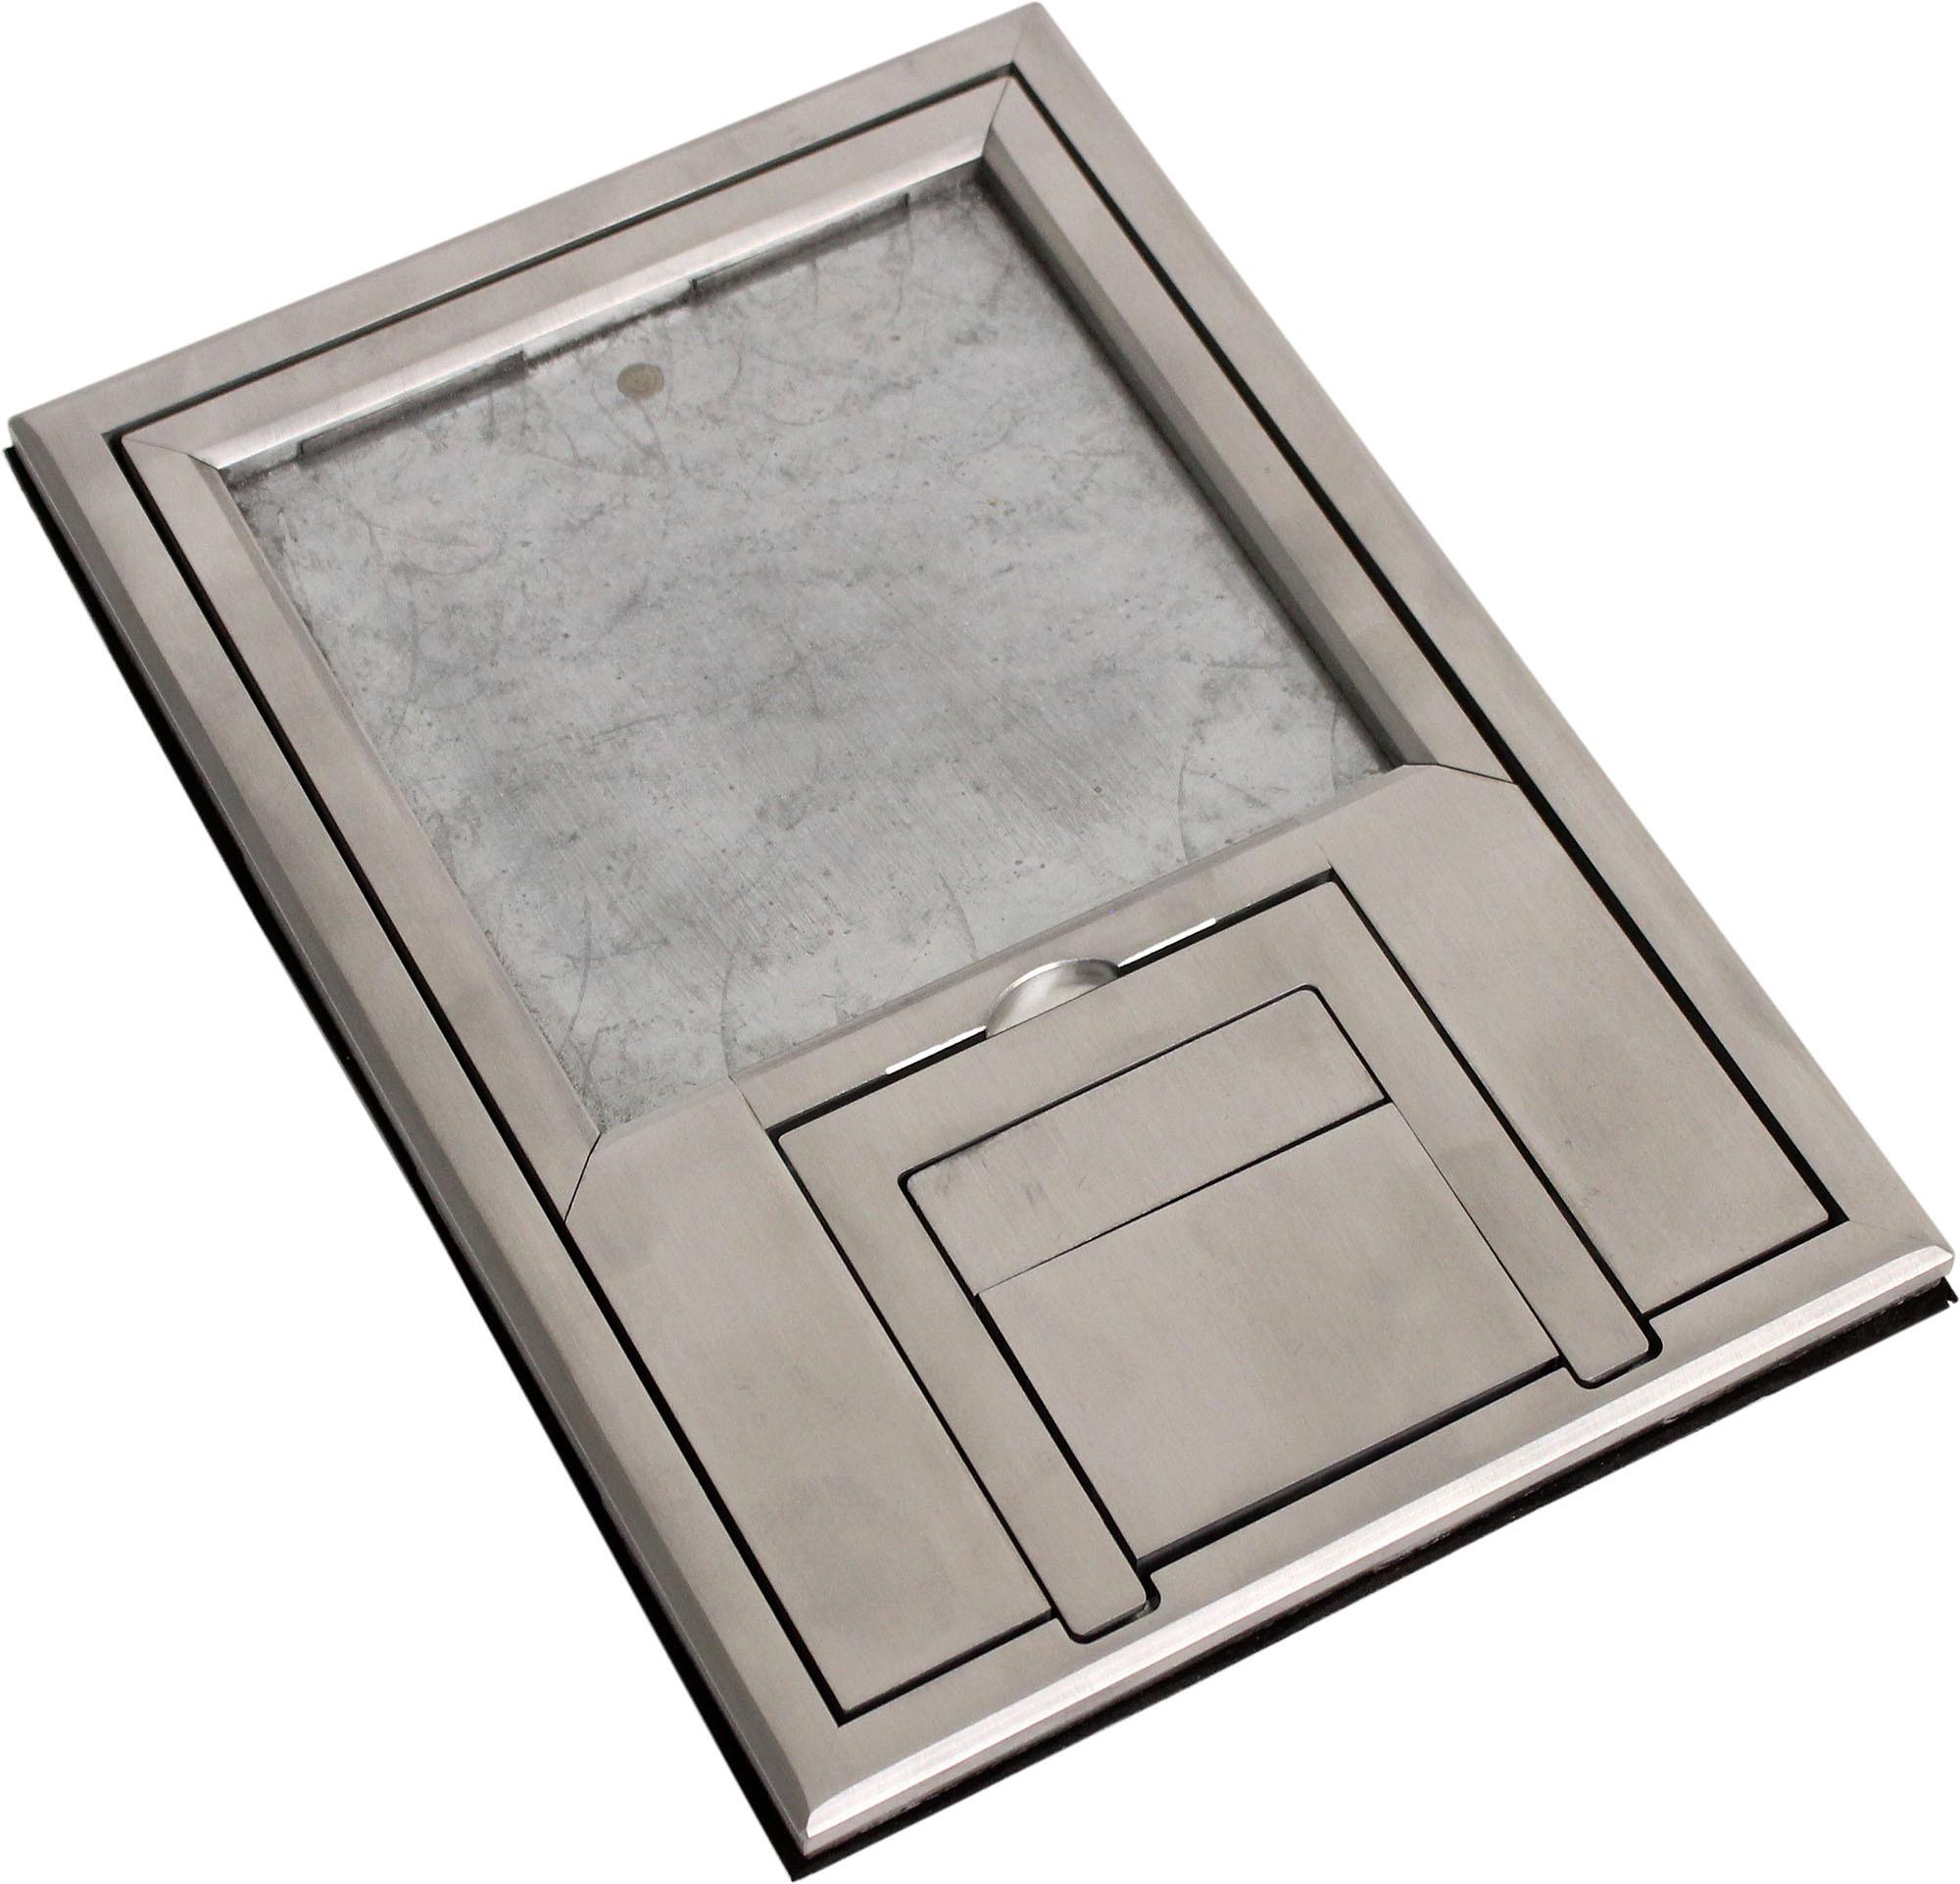 FSR FL-200-SLP U-Access FL-200 Cover with 1/4-Inch Aluminum Beveled Flange (Lift off door) FSR-FL-200-SLP